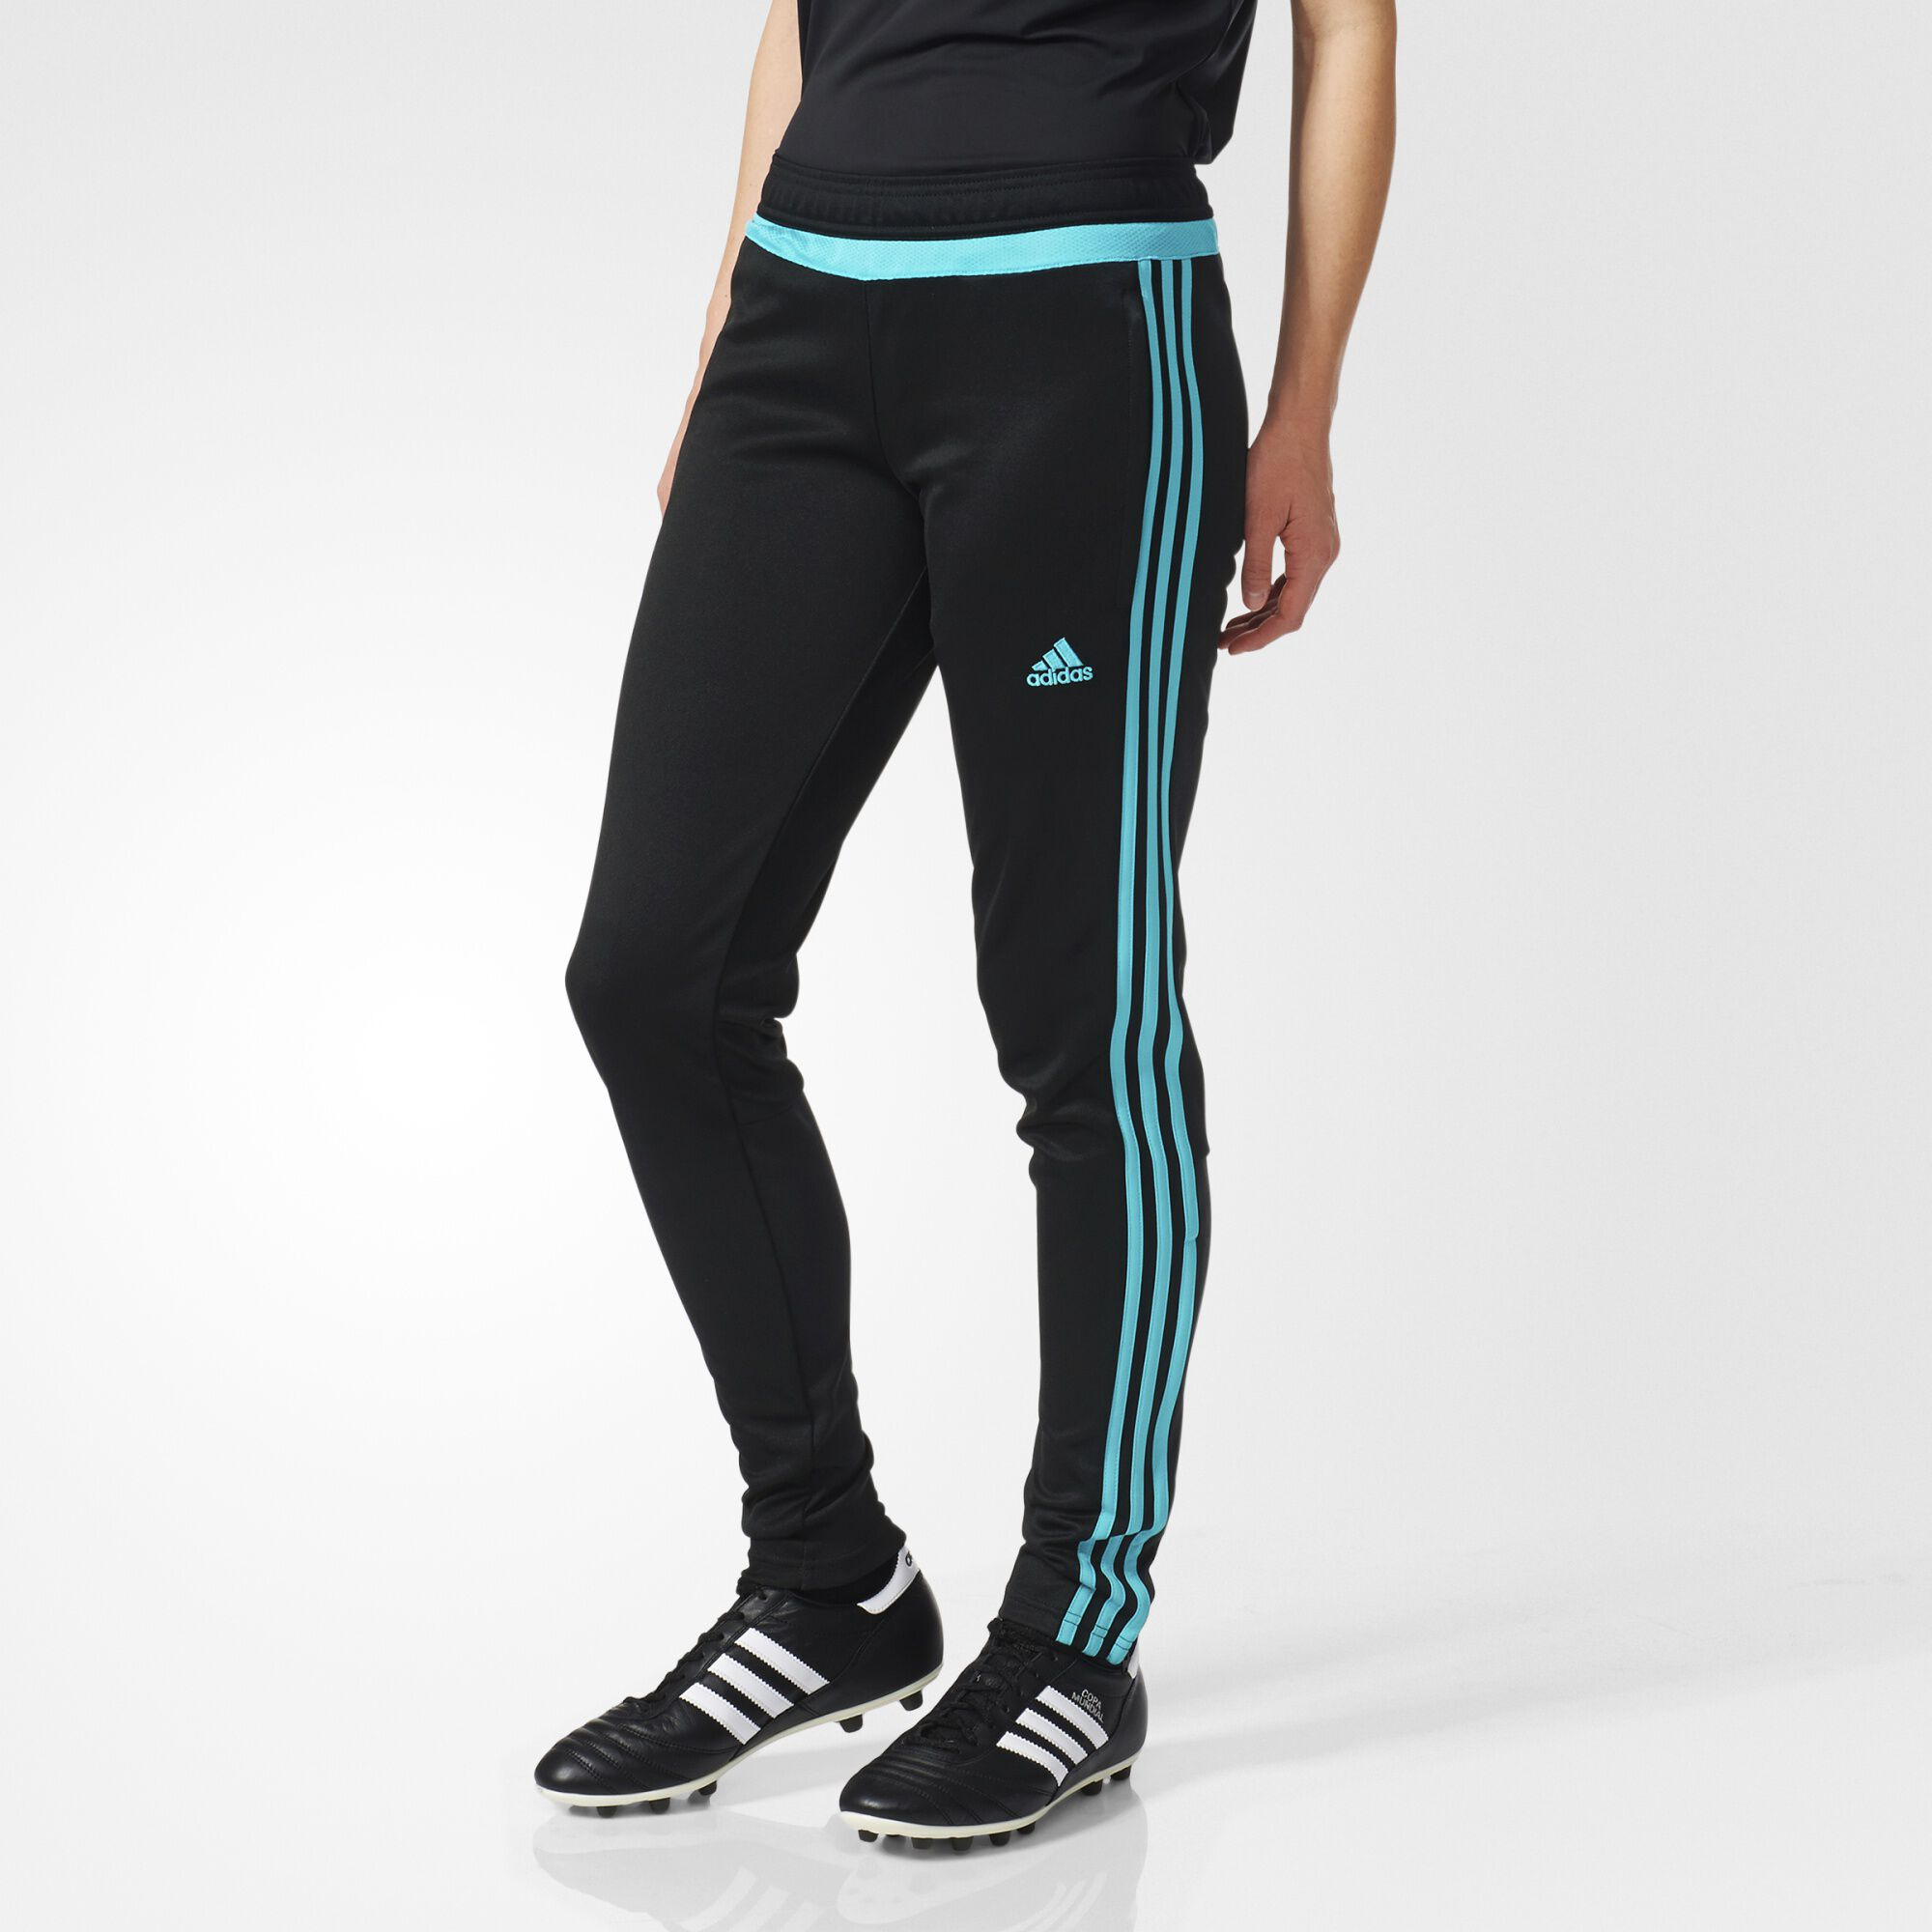 adidas tiro training pants youth